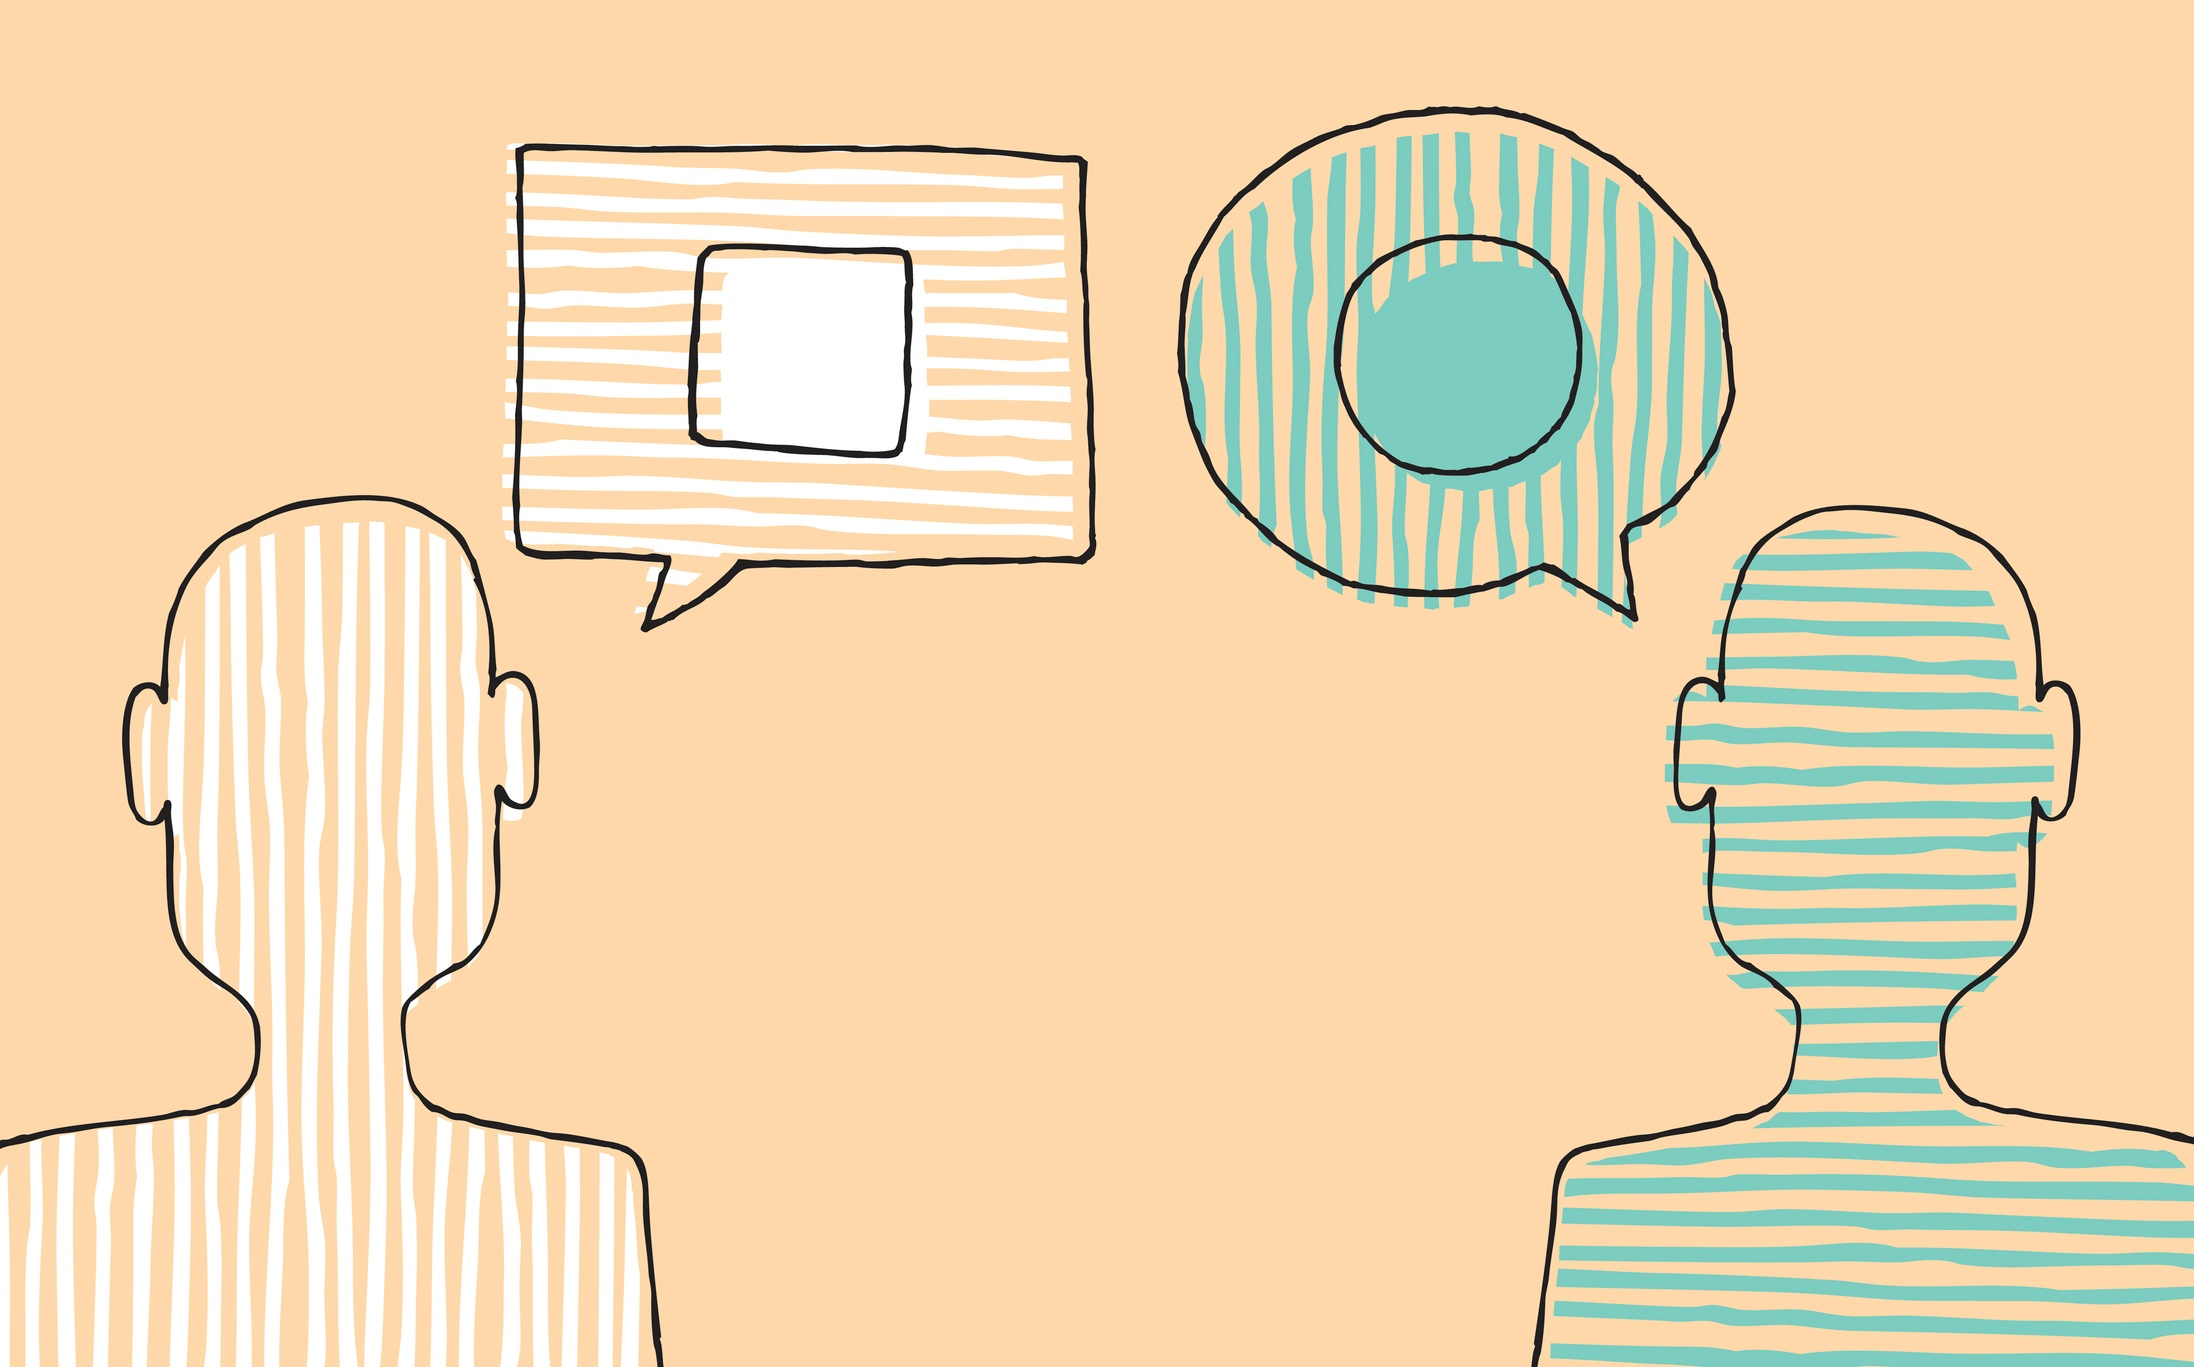 5 Técnicas para adaptar tu contenido en español a múltiples audiencias